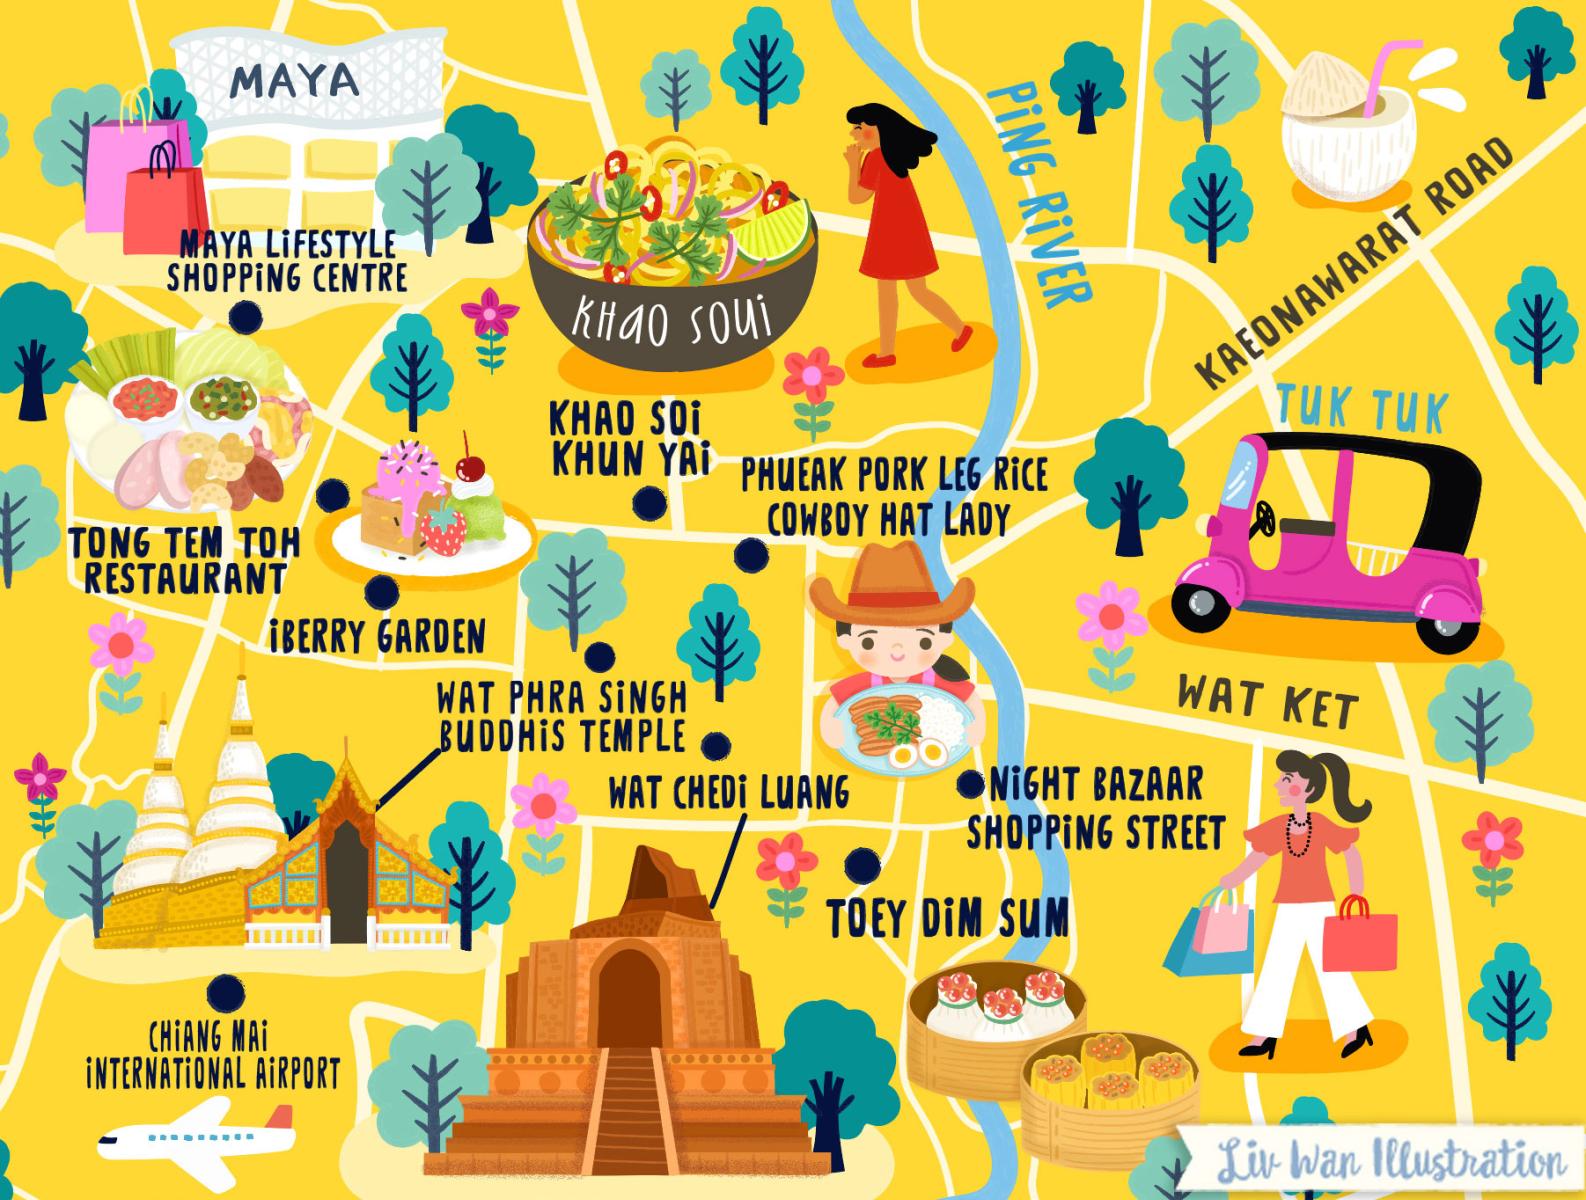 Chiang Mai Thailand Map Chiang Mai Thailand Map Illustration by Liv Wan on Dribbble